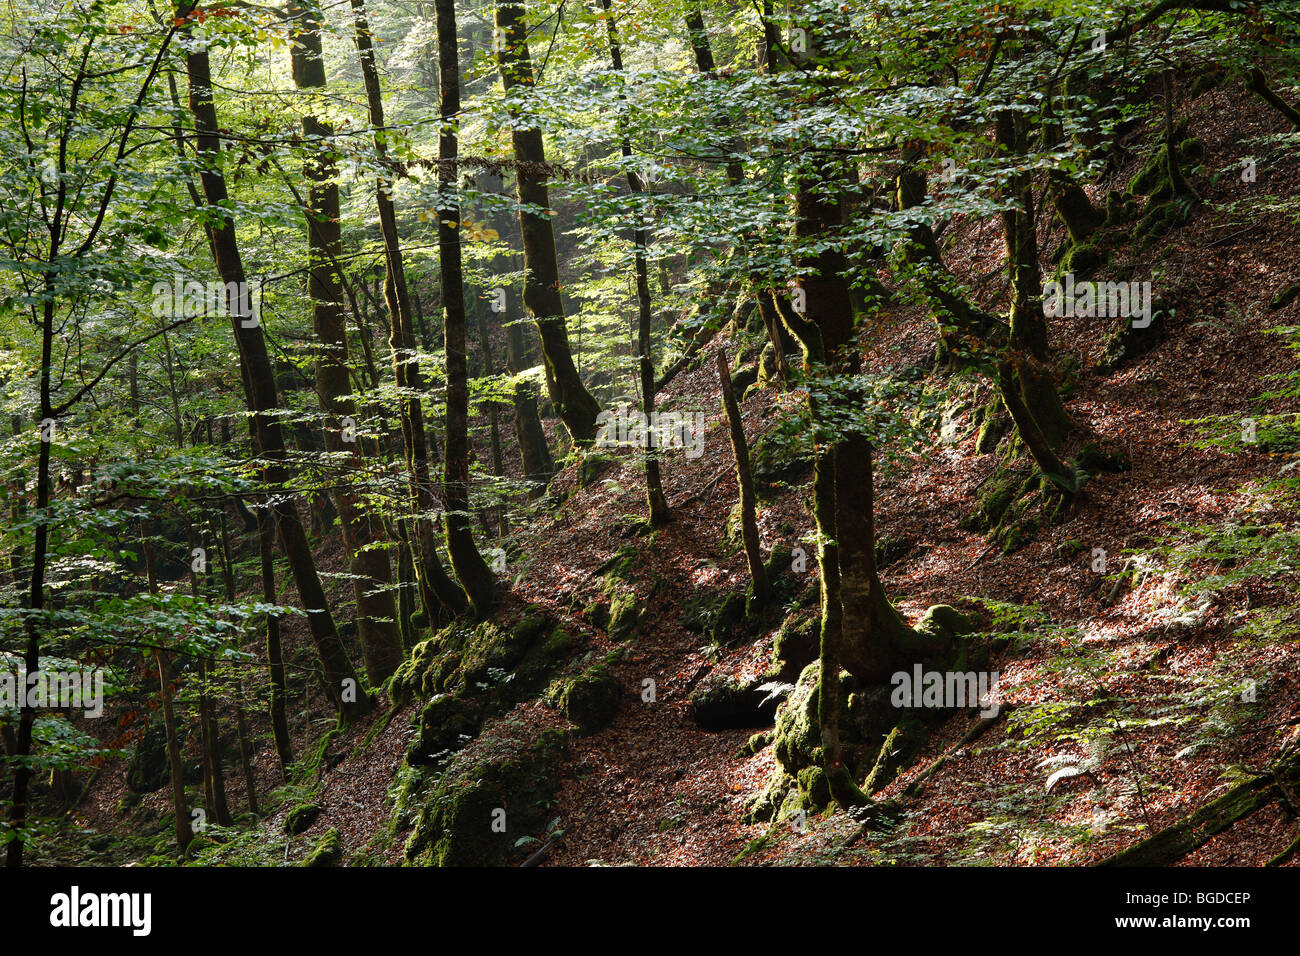 Montane Wald, Nationalpark Risnjak, Gorski Kotar, Kroatien, Europa Stockbild